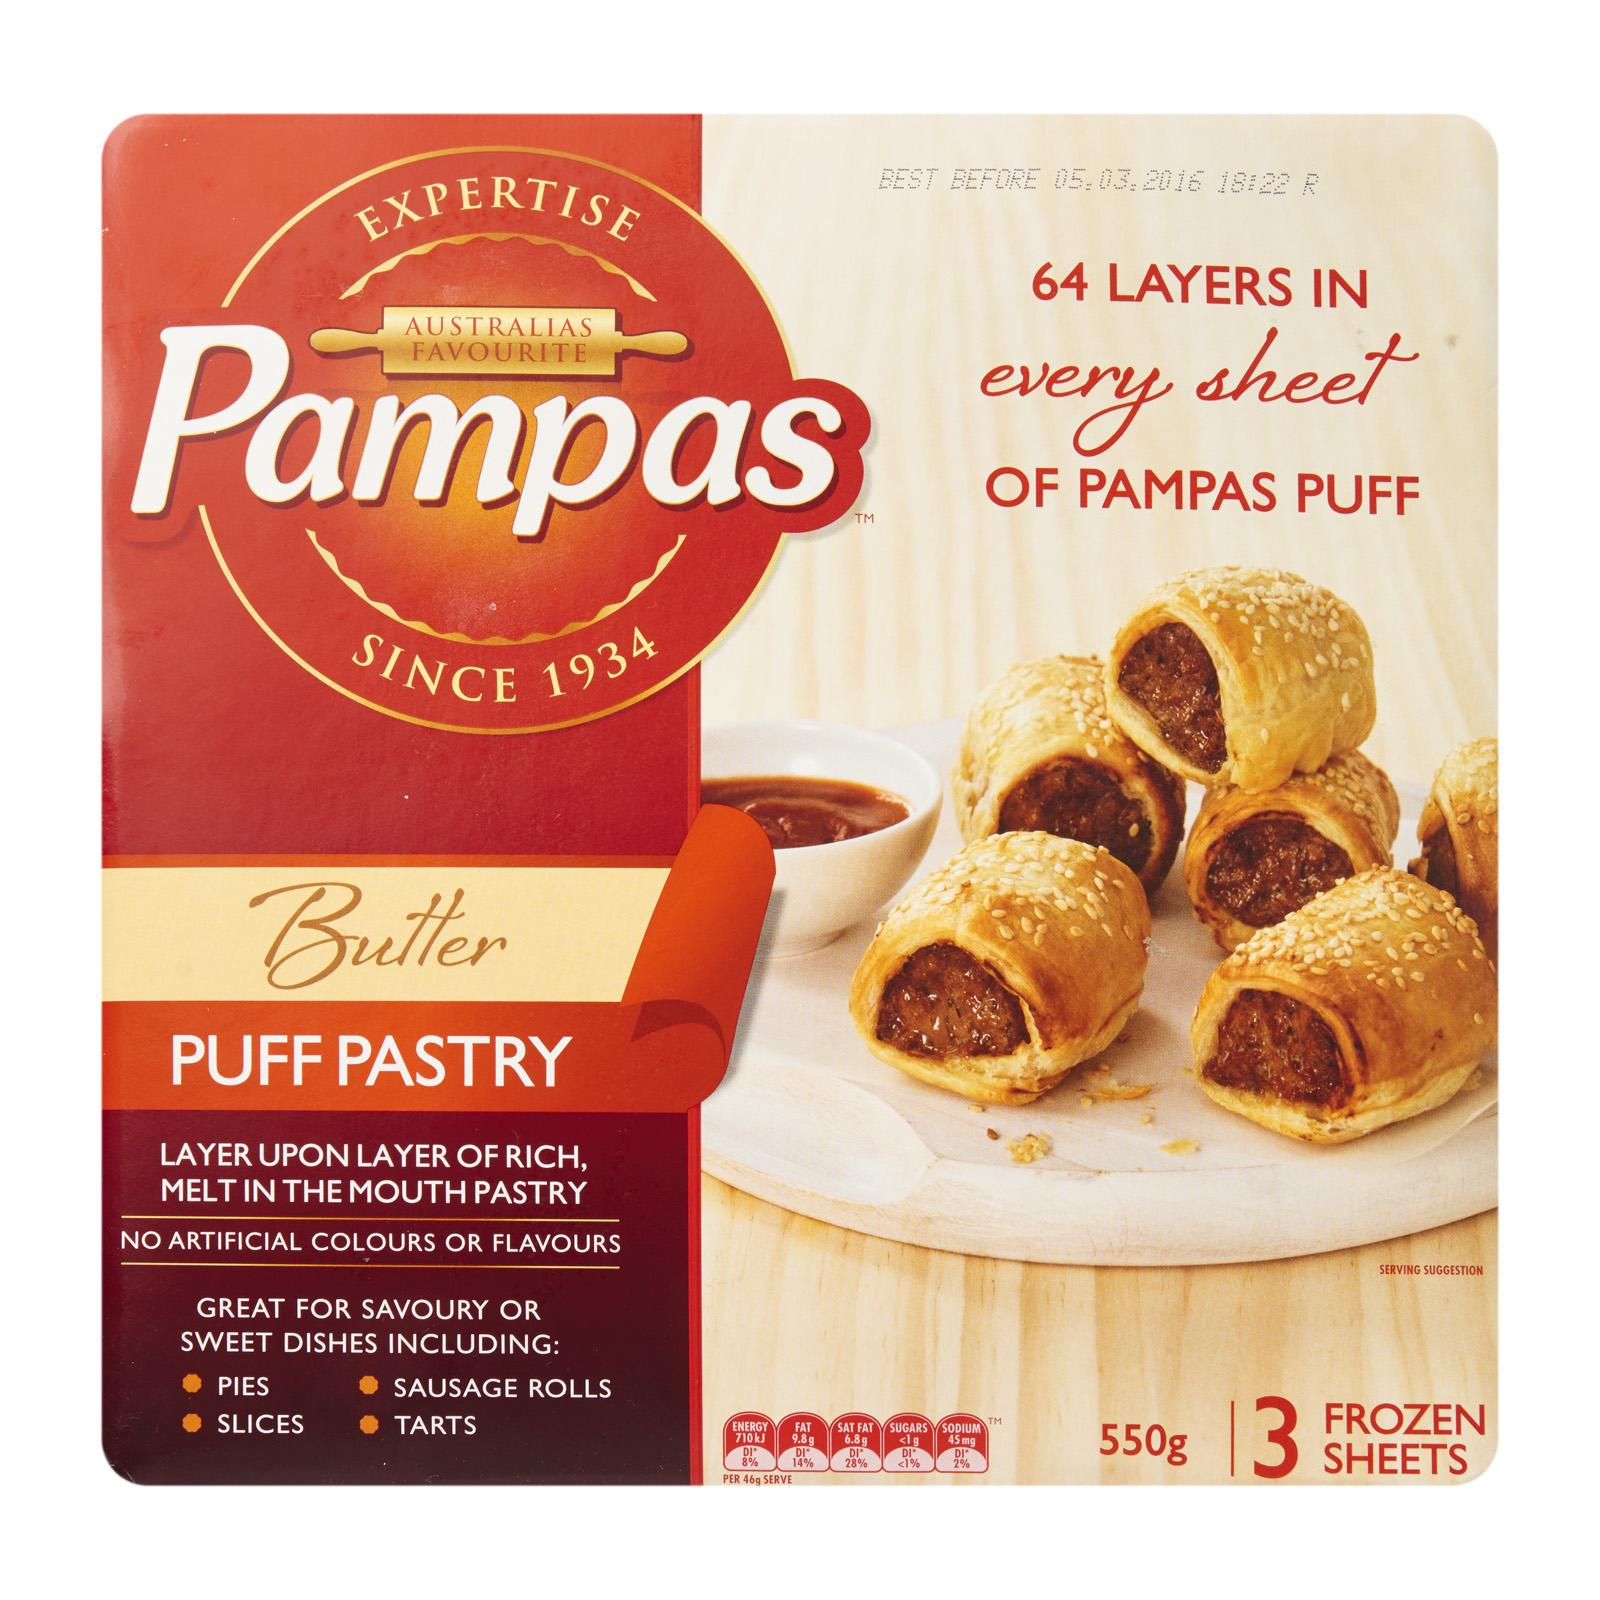 Pampas Pampas R/r Butter Puff Sheets (3 Sheets) - Frozen By Redmart.